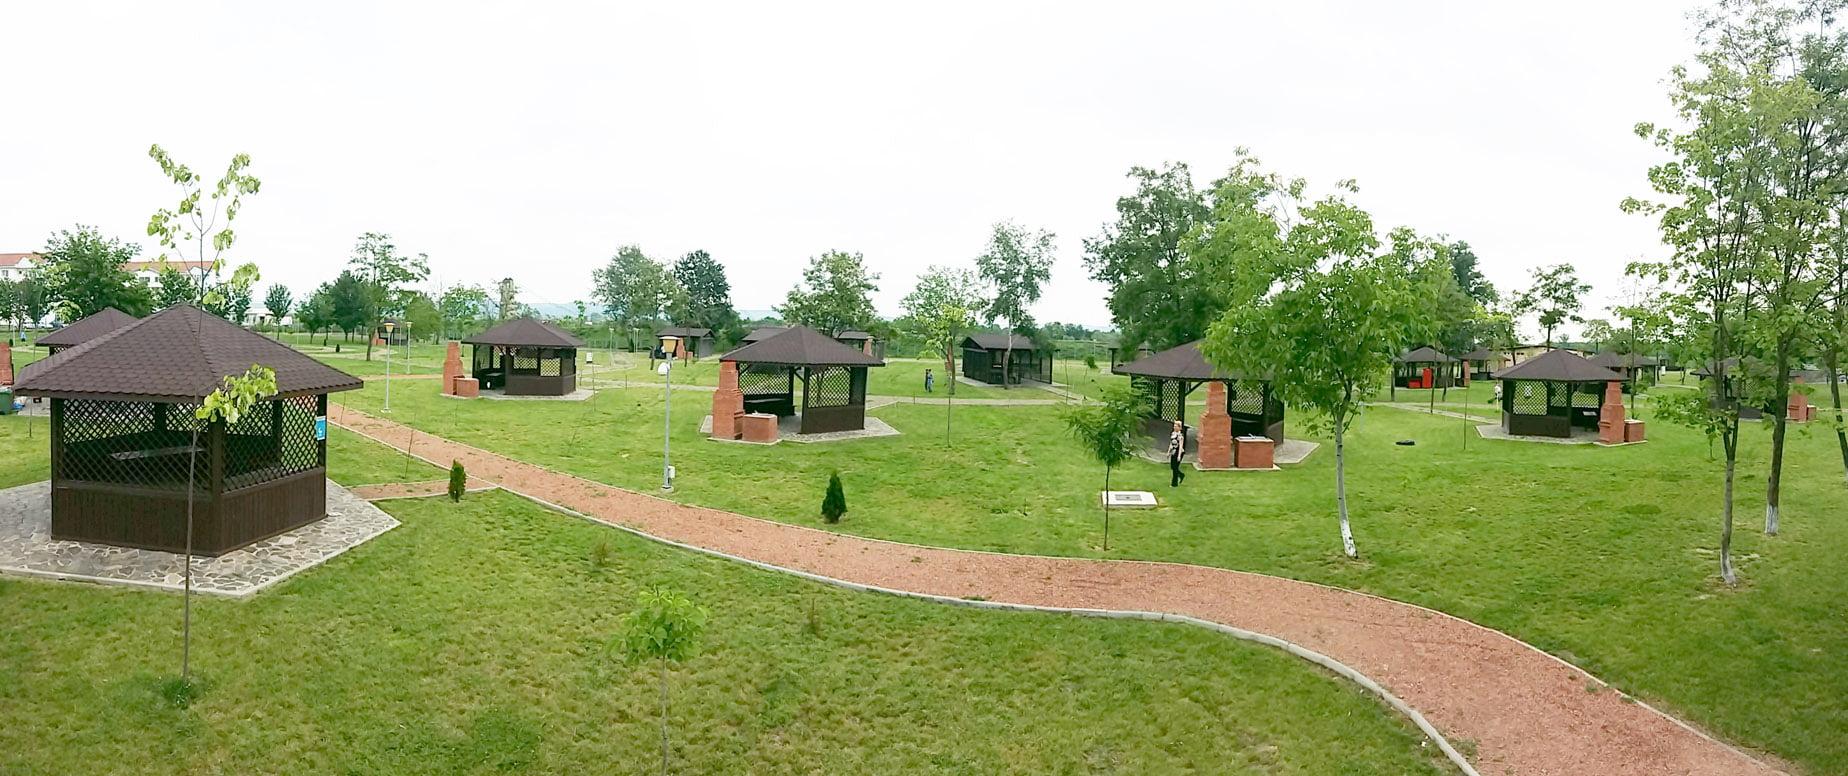 Vineri se deschide zona de picnic de lângă ștrand